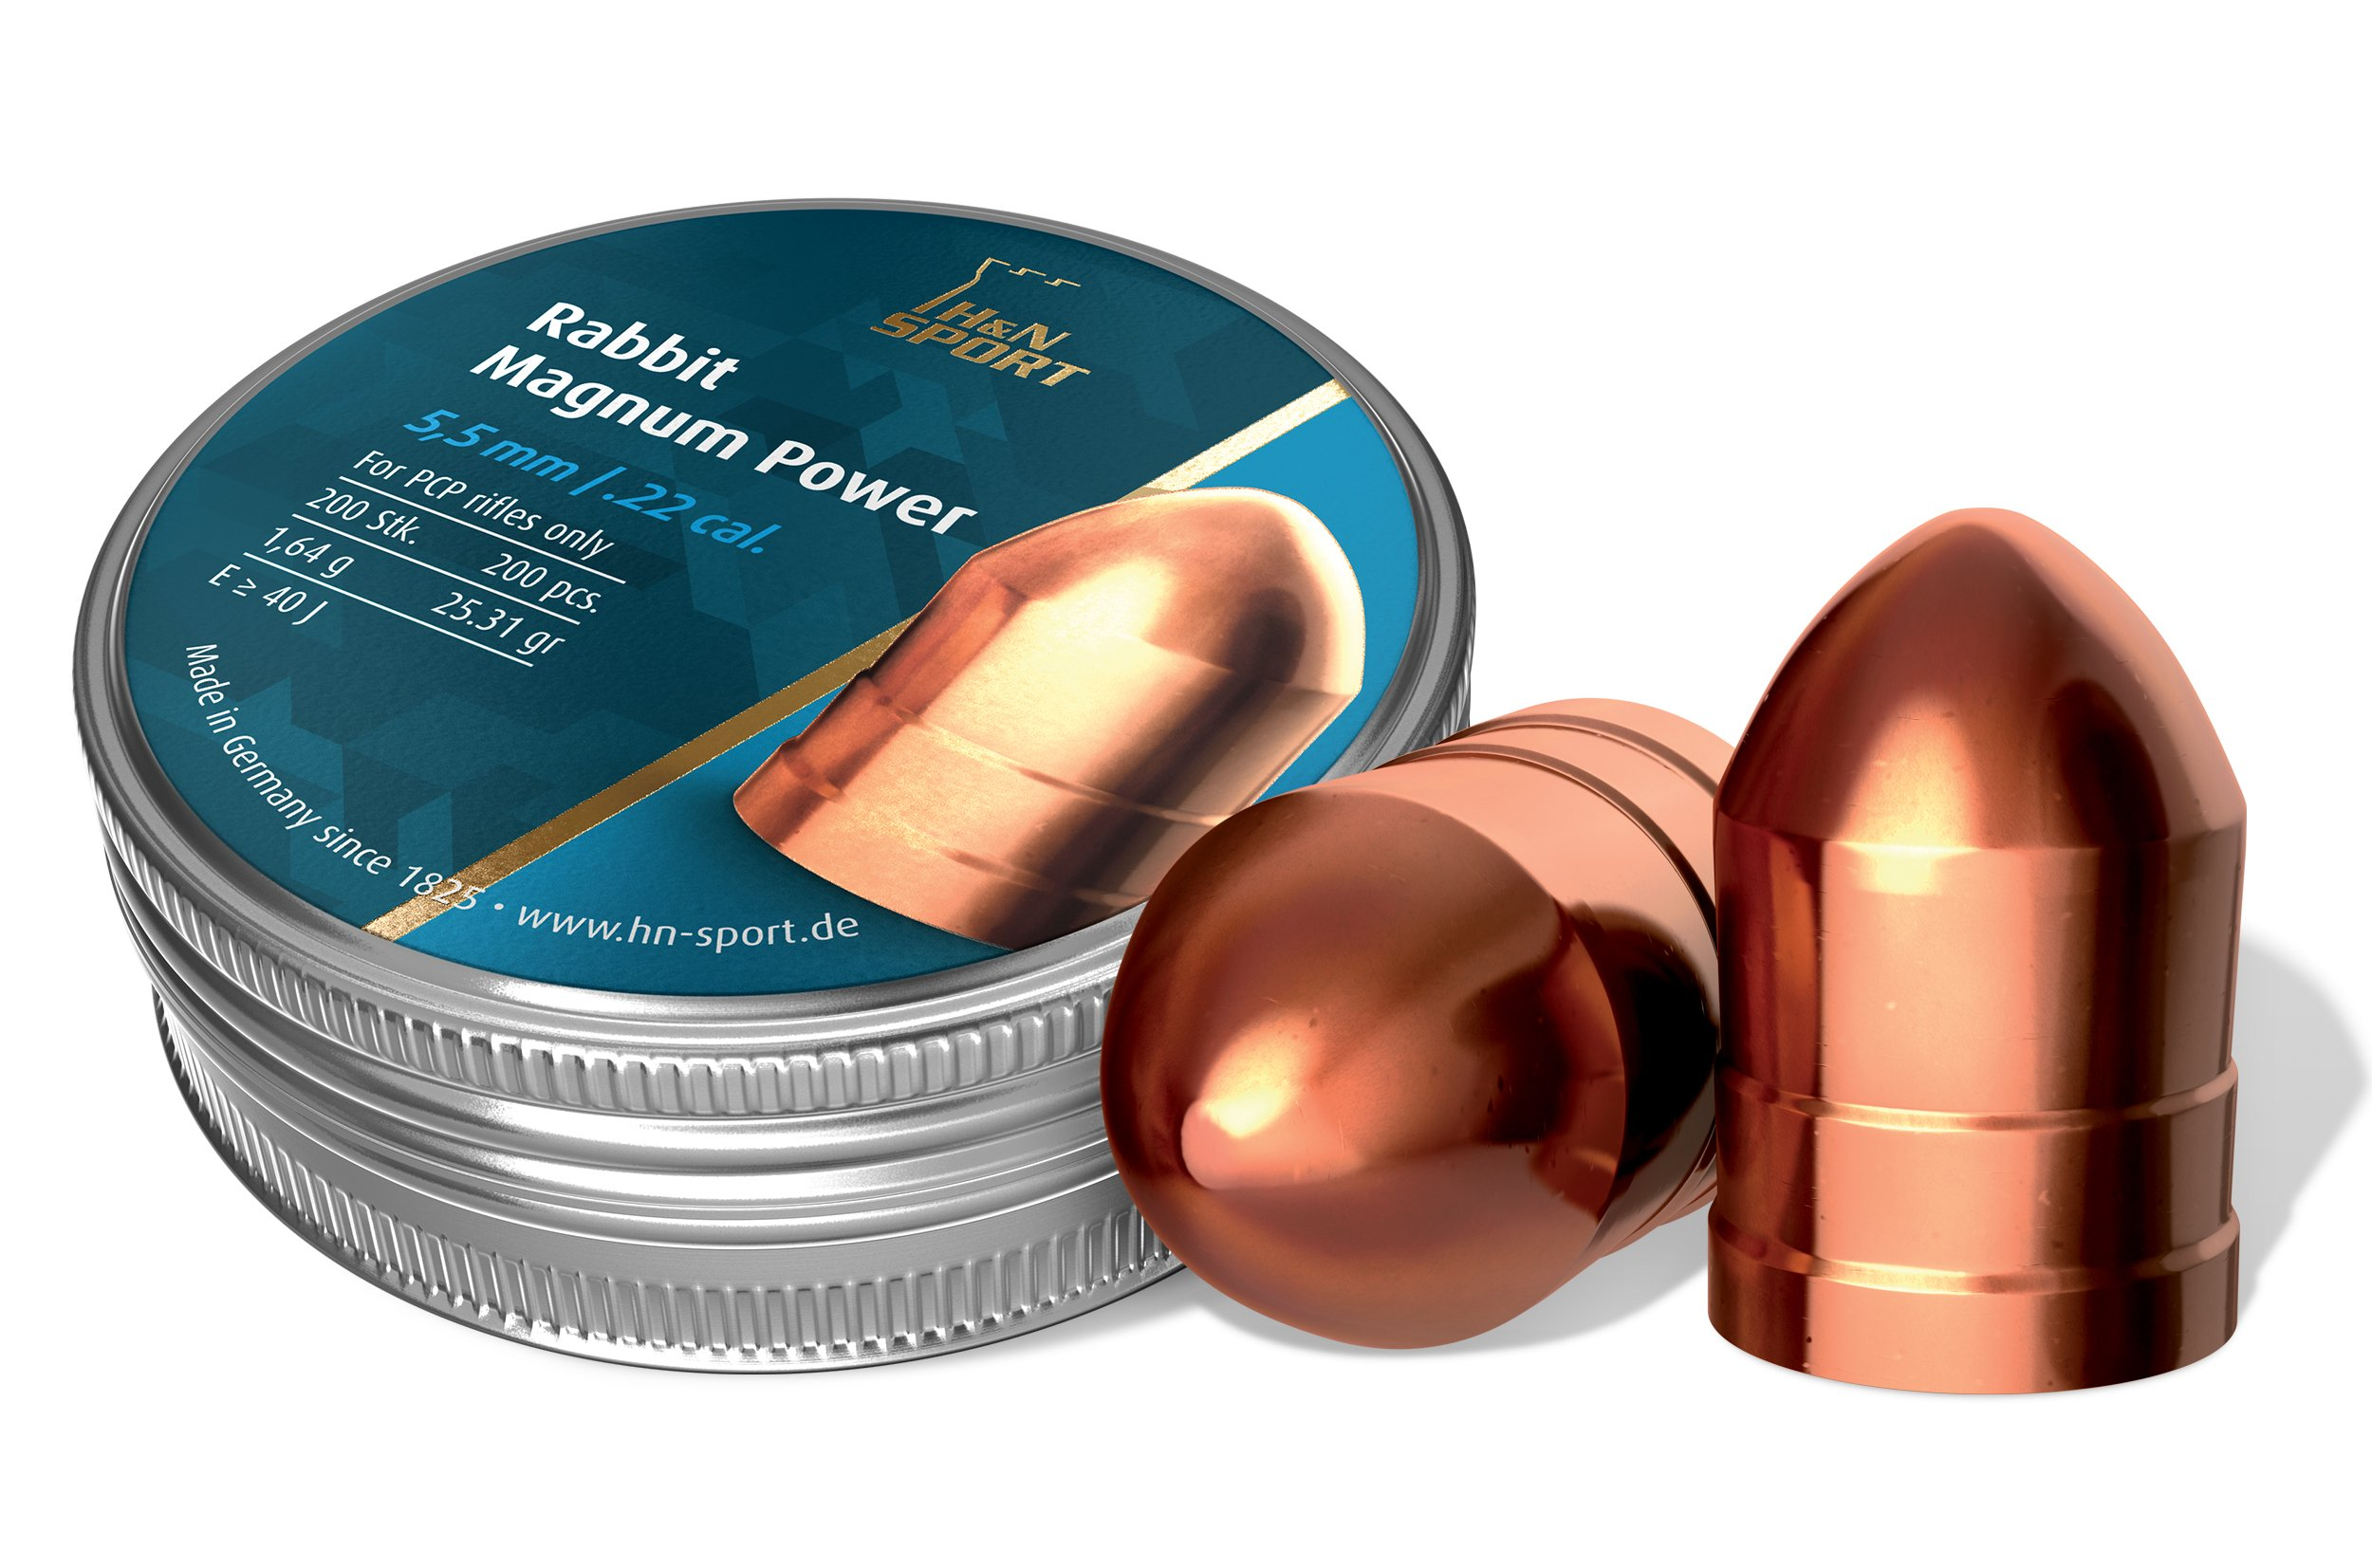 Haendler & Natermann H&N Rabbit Magnum Power Rounded Cylindrical Airgun Pellets .22 Caliber / 25.77 Grains (200 Count)